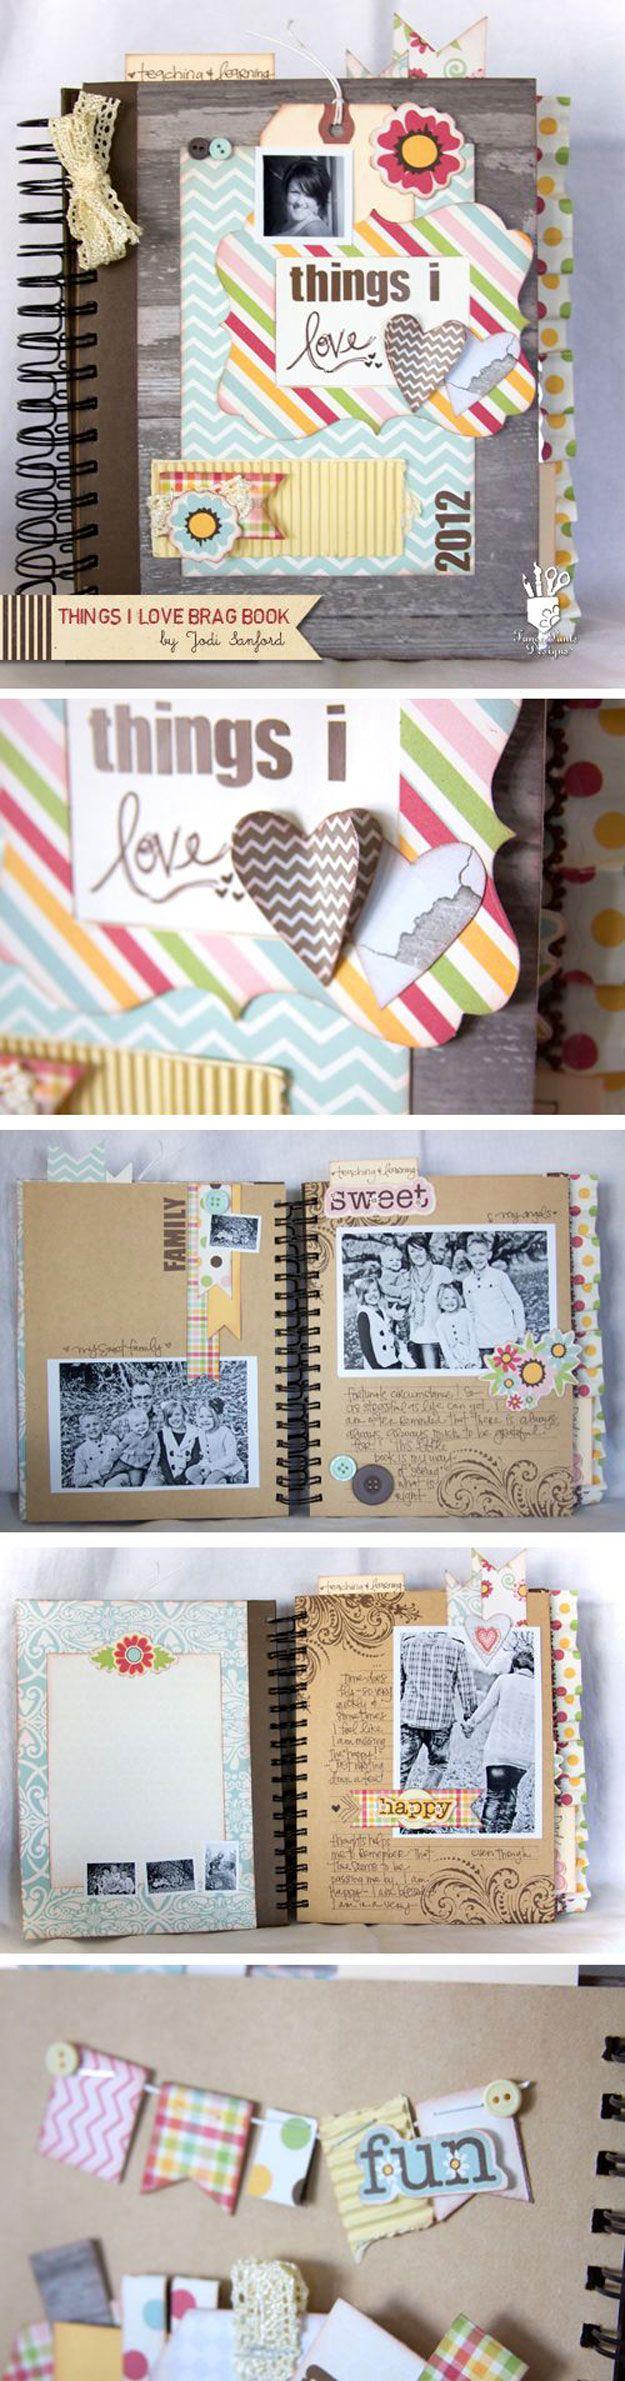 Scrapbook notebook ideas - 33 Creative Scrapbook Ideas Every Crafter Should Know